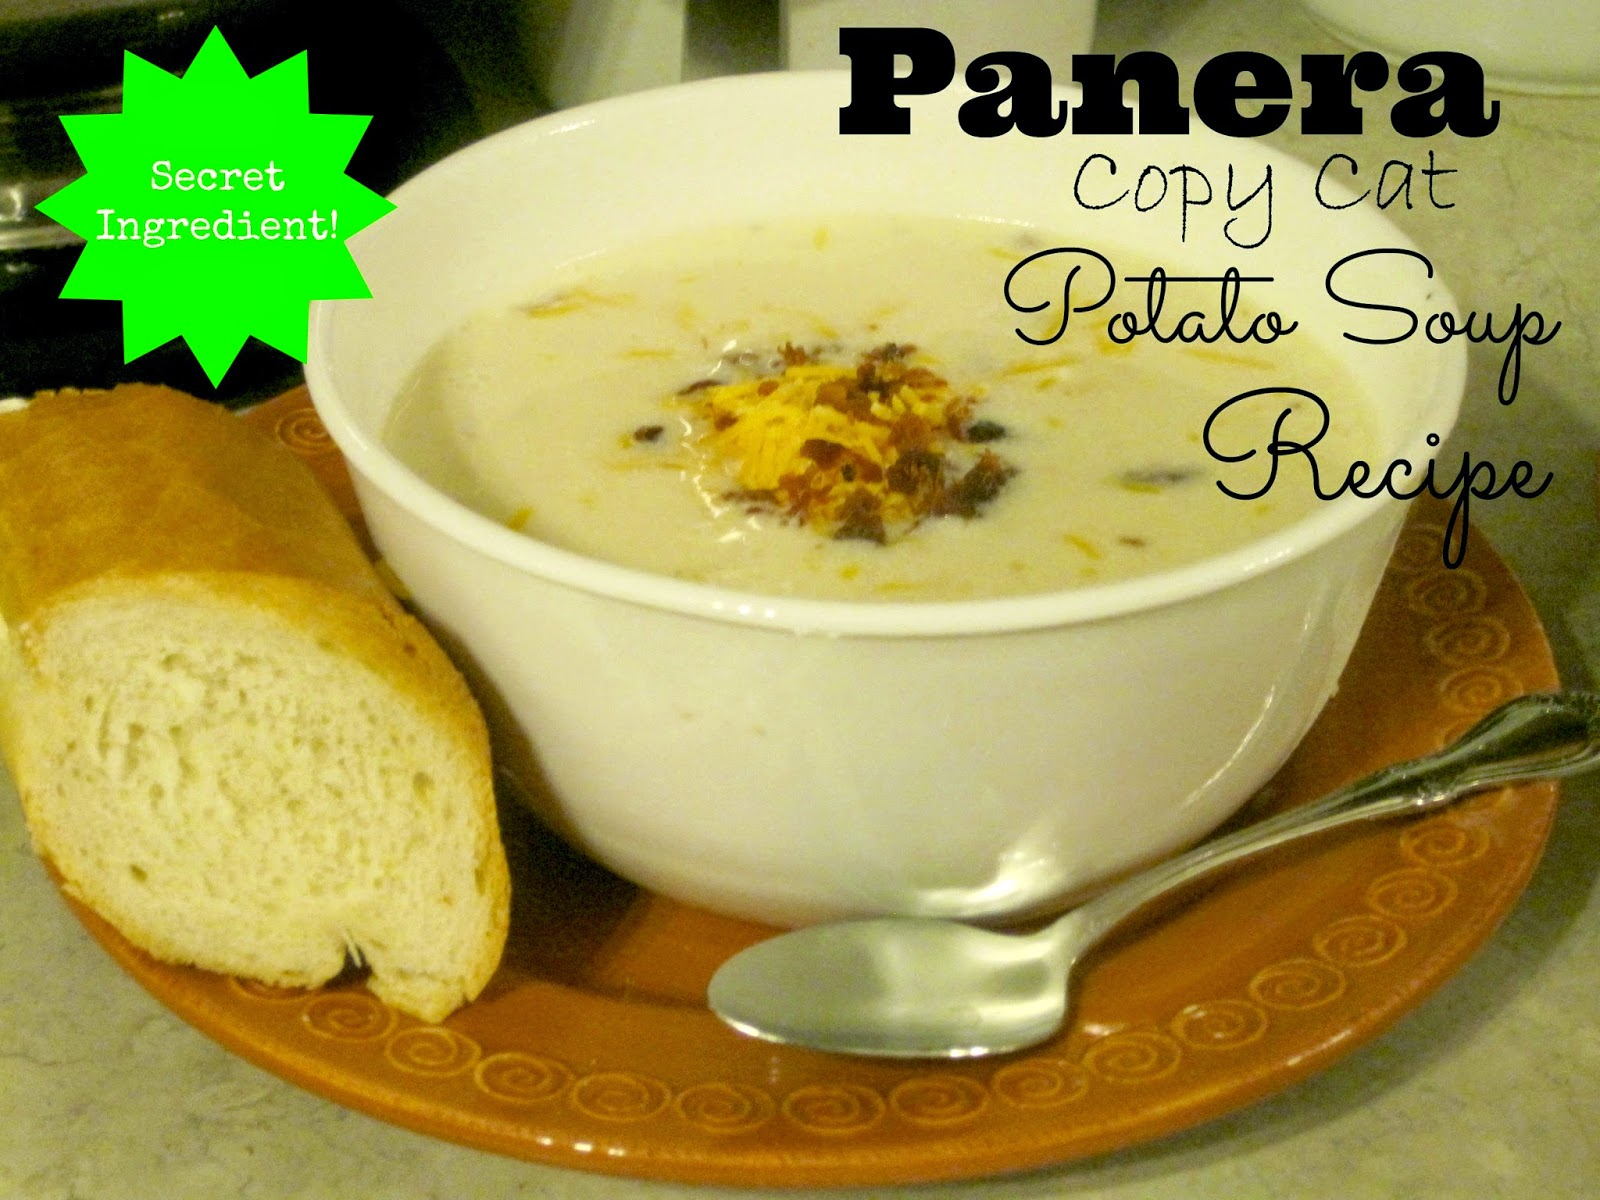 http://decoratedchaos.blogspot.com/2013/11/potato-soup-recipe-panera-copy-cat.html